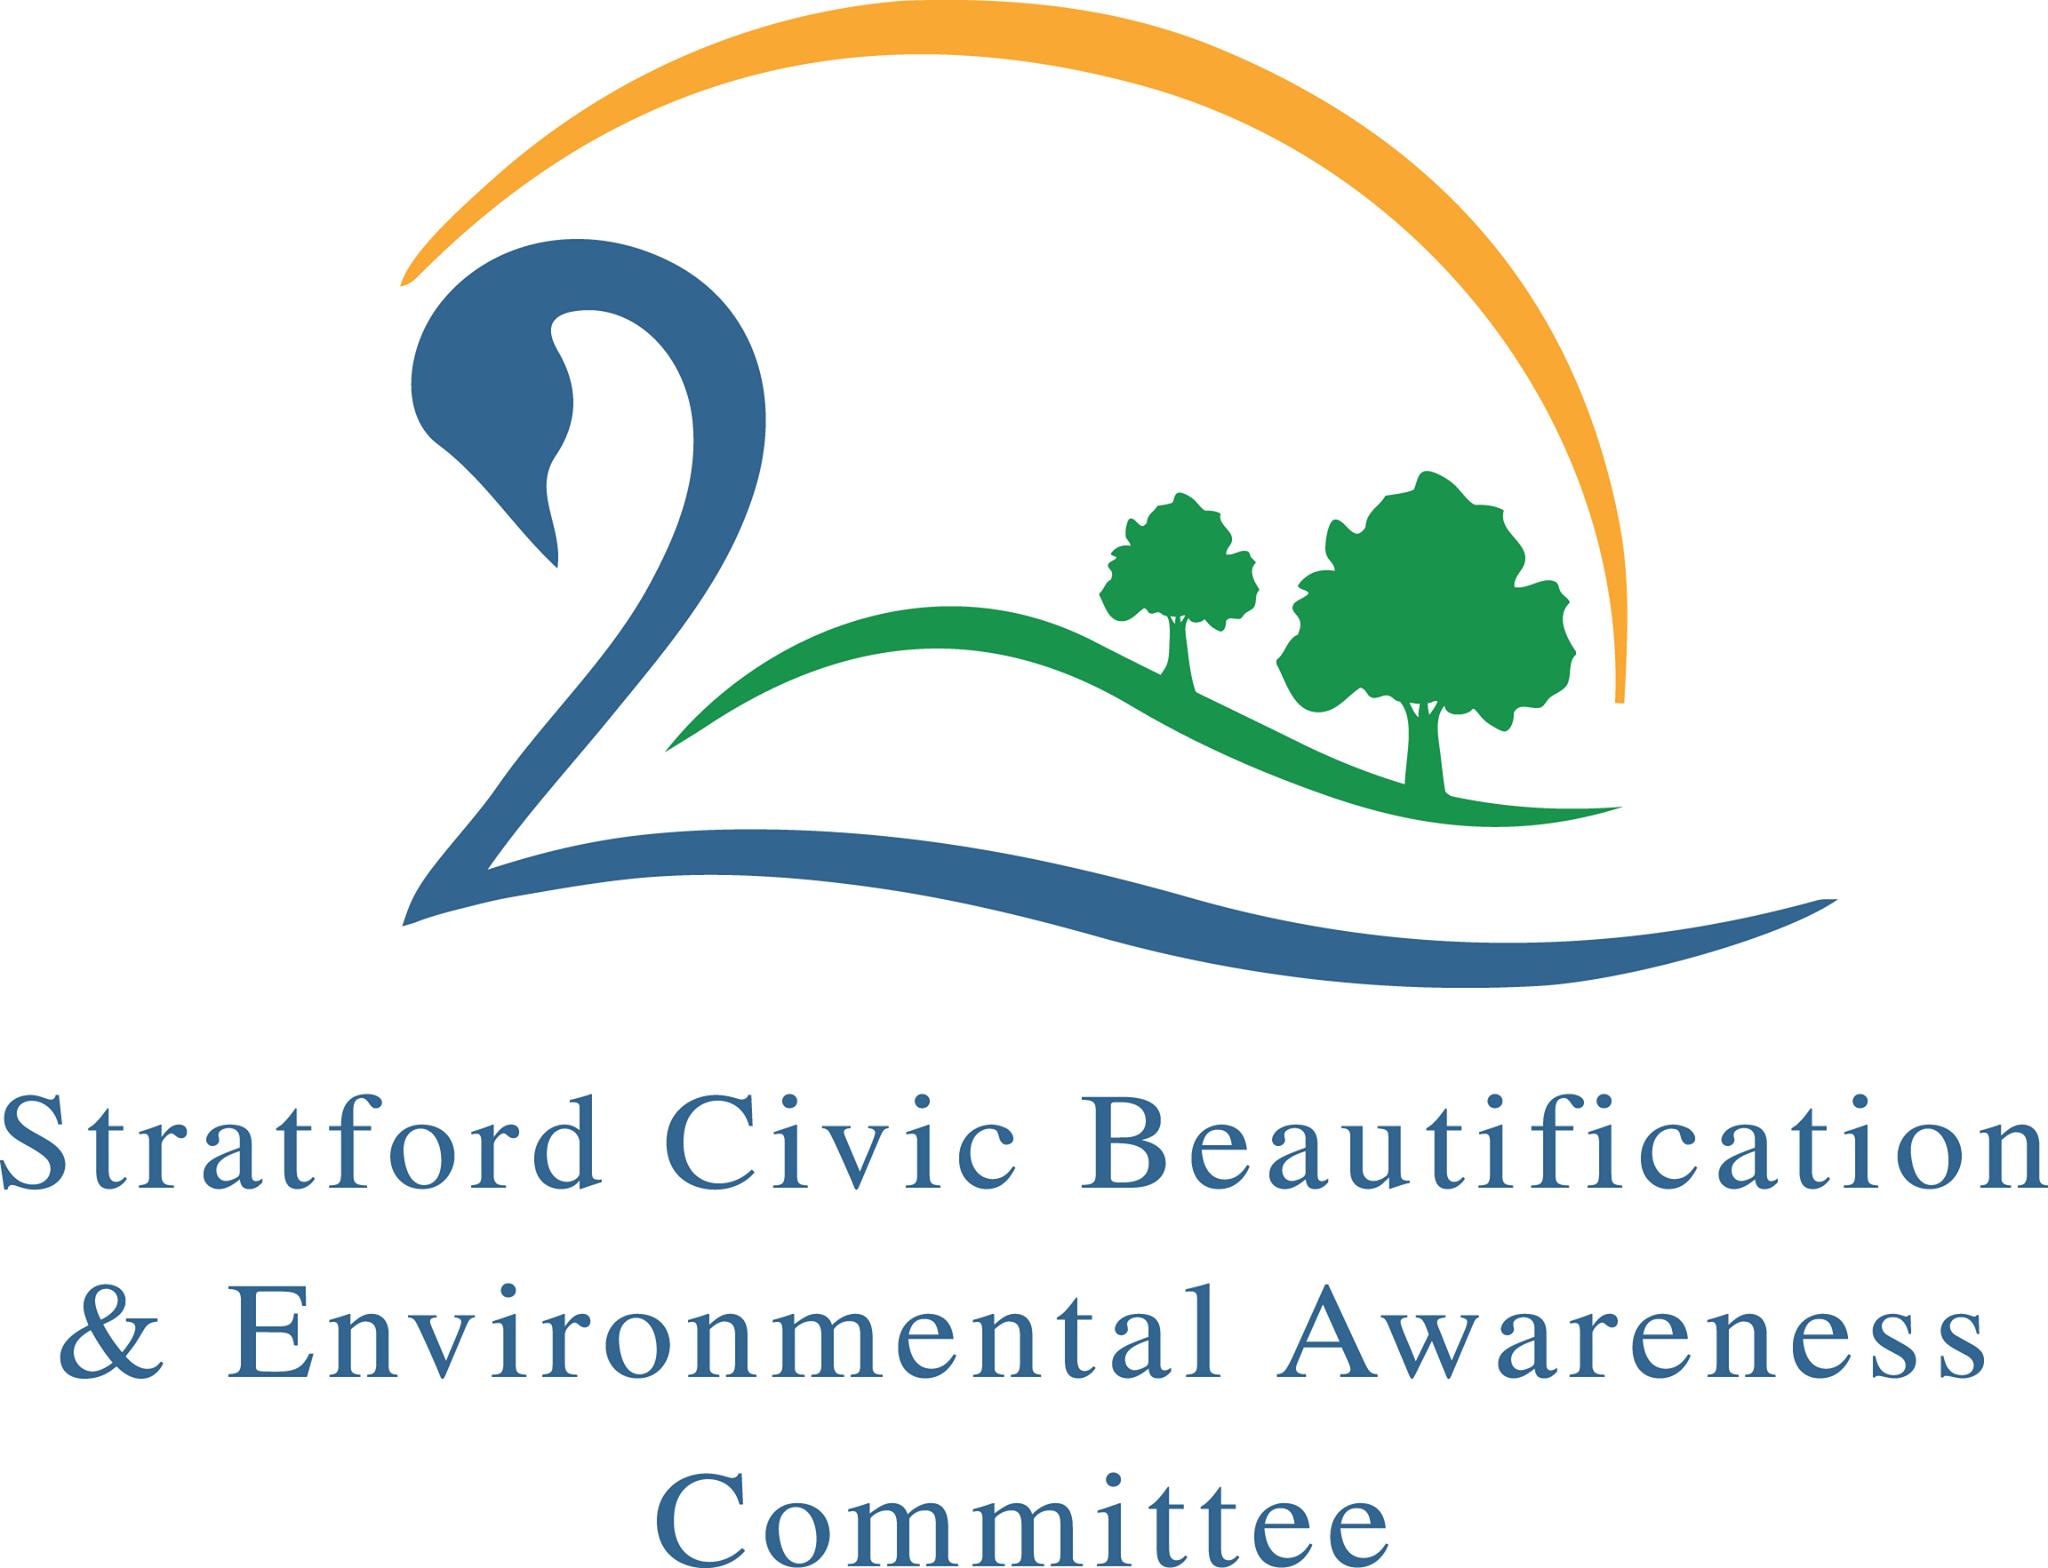 Stratford Civic Beautification & Environmental Awareness Committee